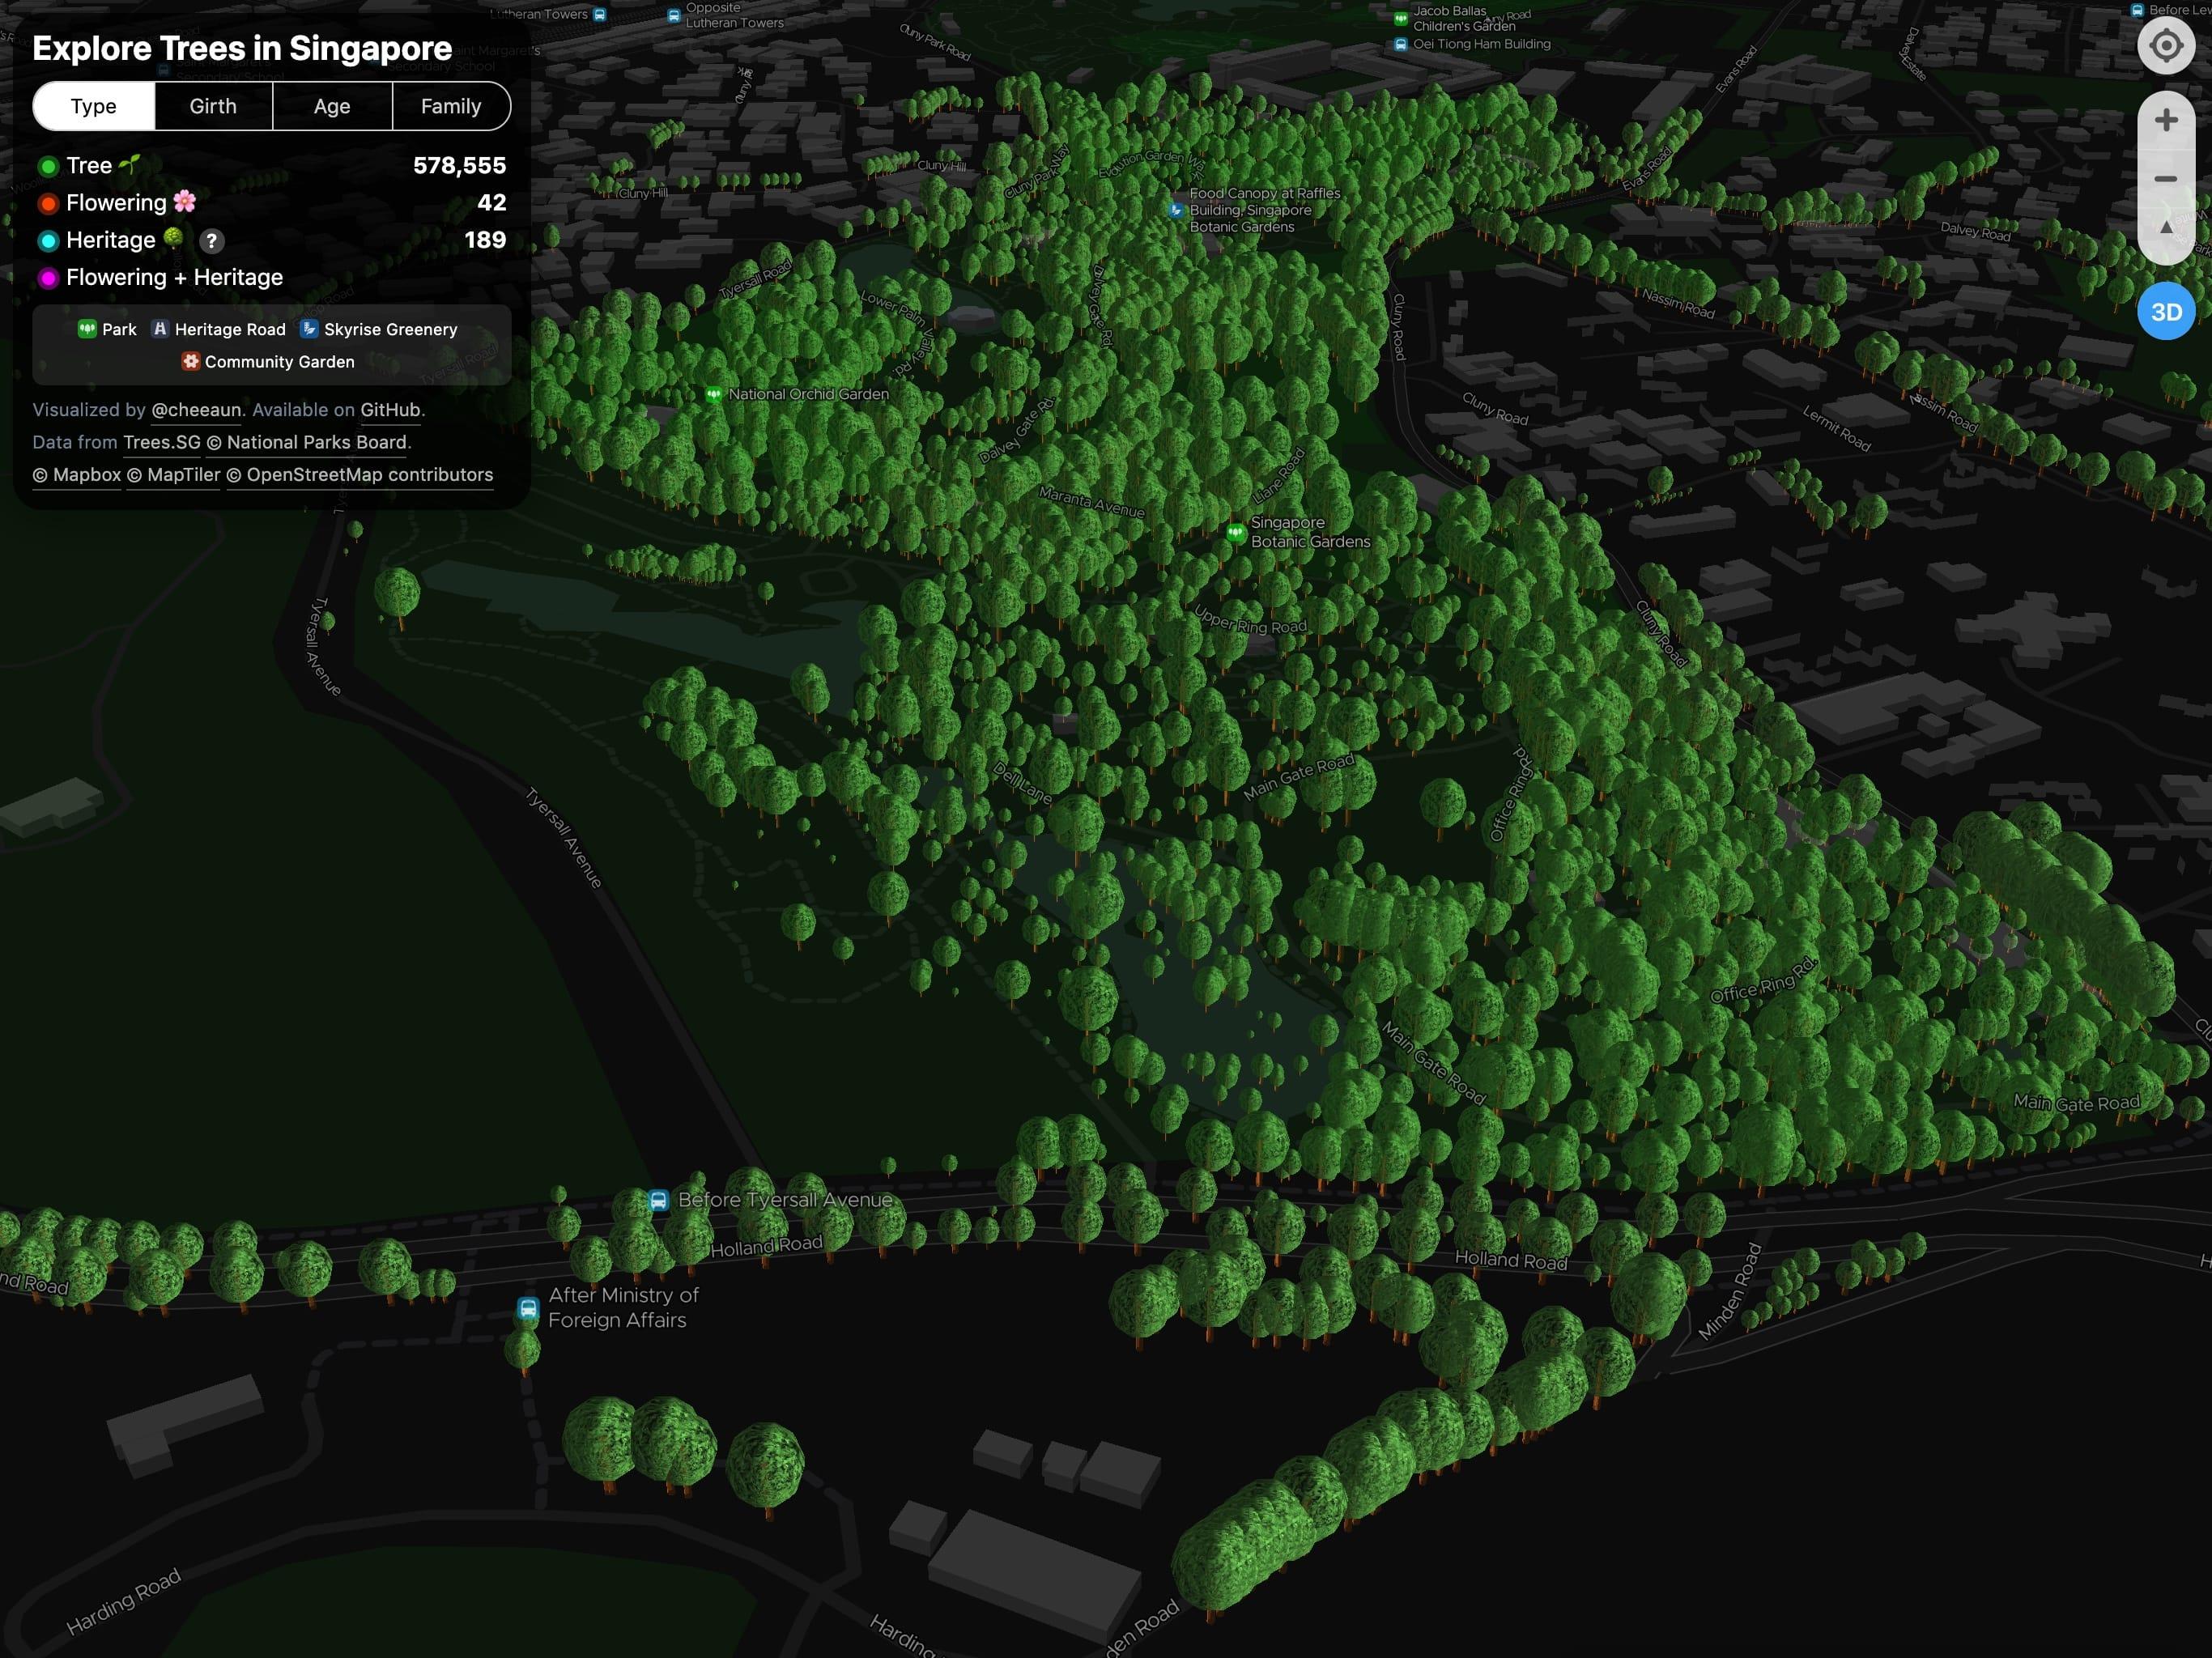 exploretrees-sg-3d-trees-overview@2x